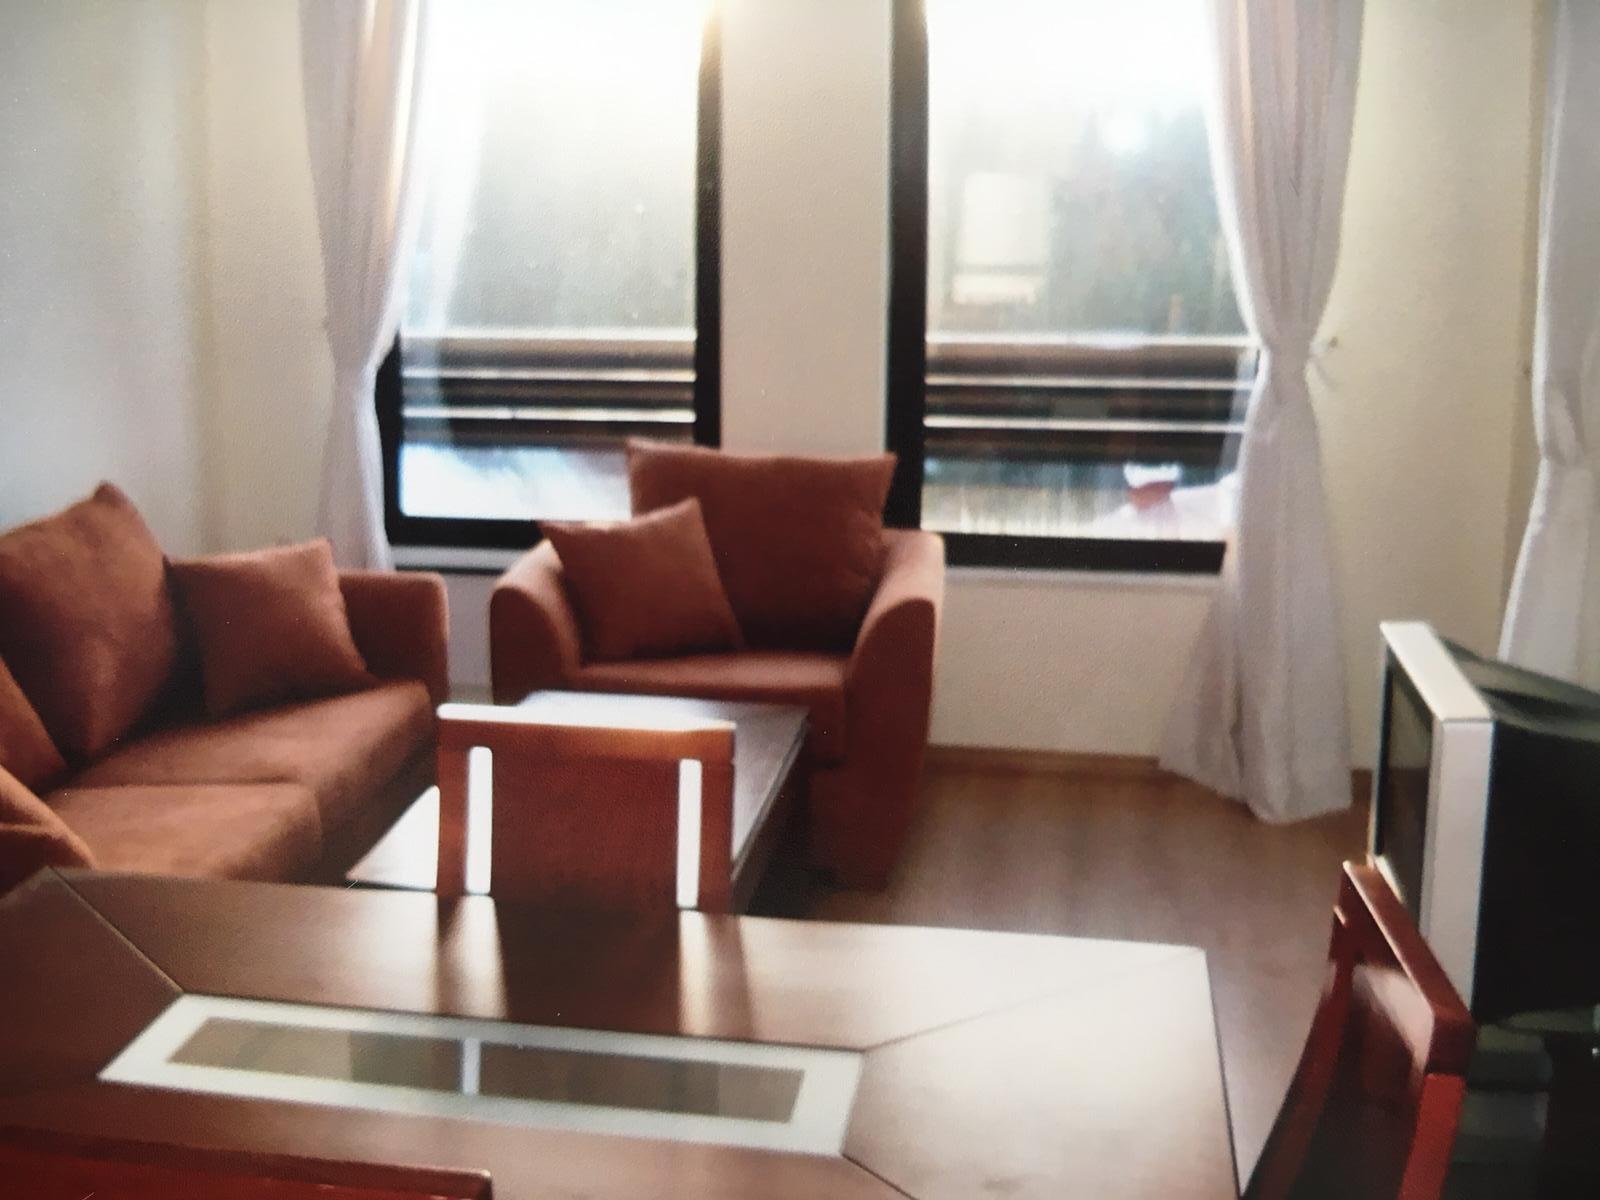 1569506669-sell-property-103b5ac2-a083-4191-bb18-1ecab5bae238.jpg